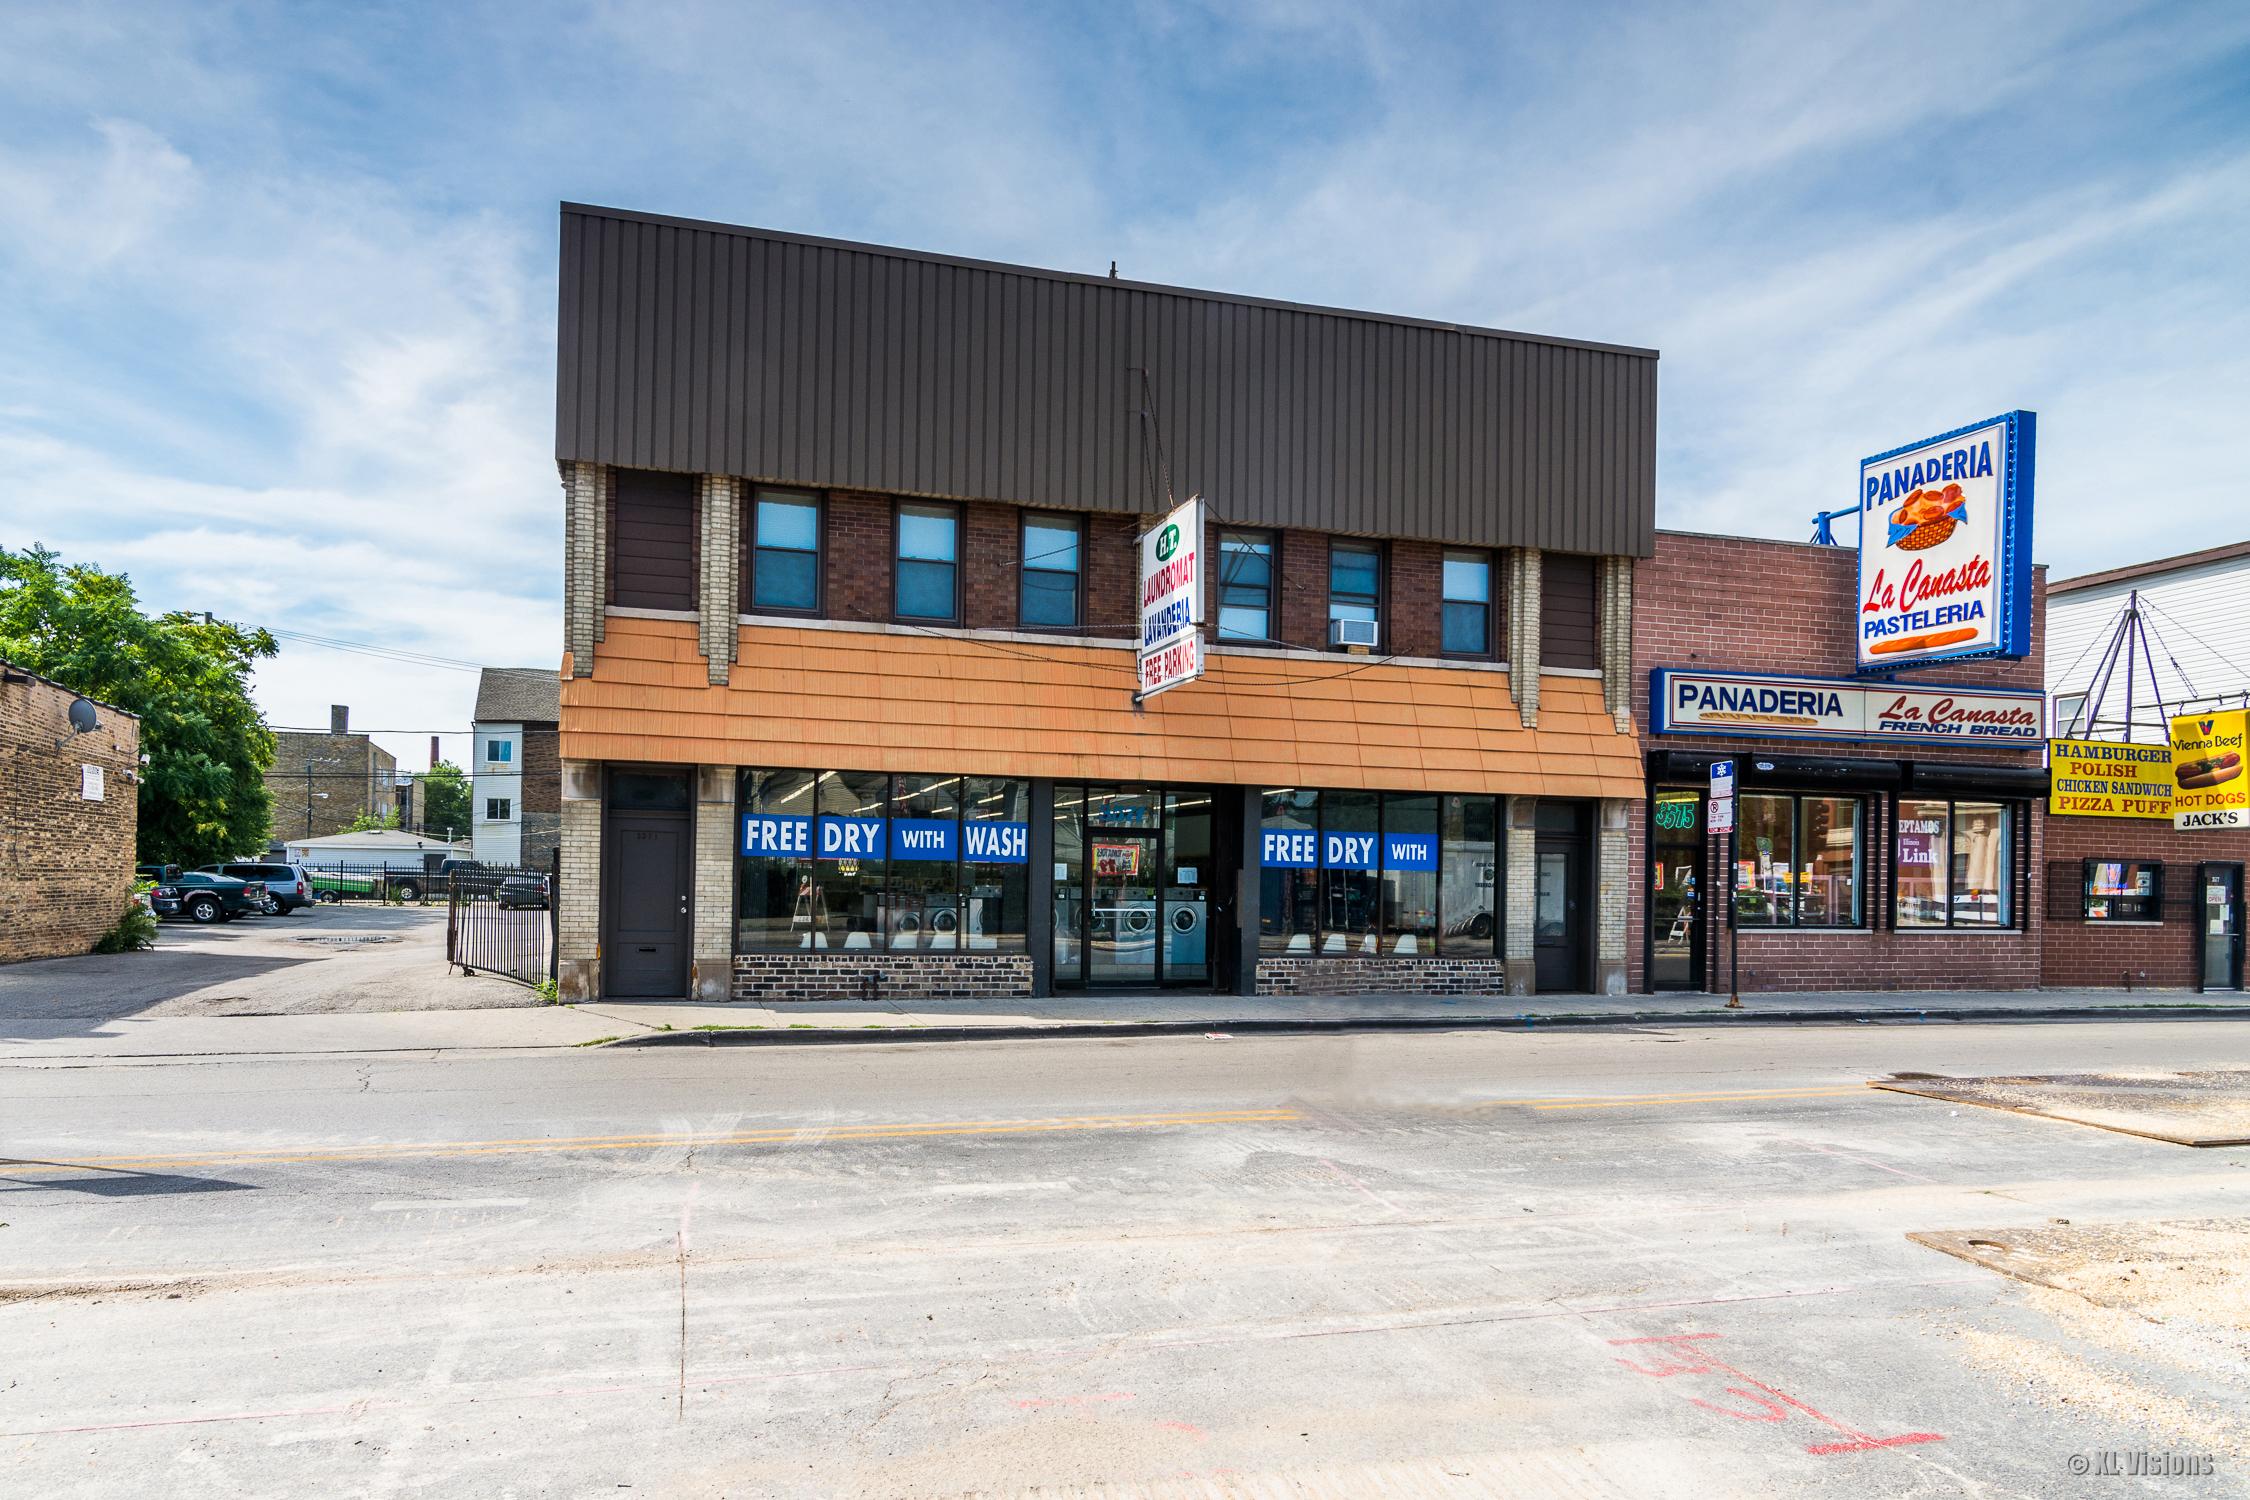 3571 W Armitage Ave , Chicago, Illinois 60647 | 3 Units